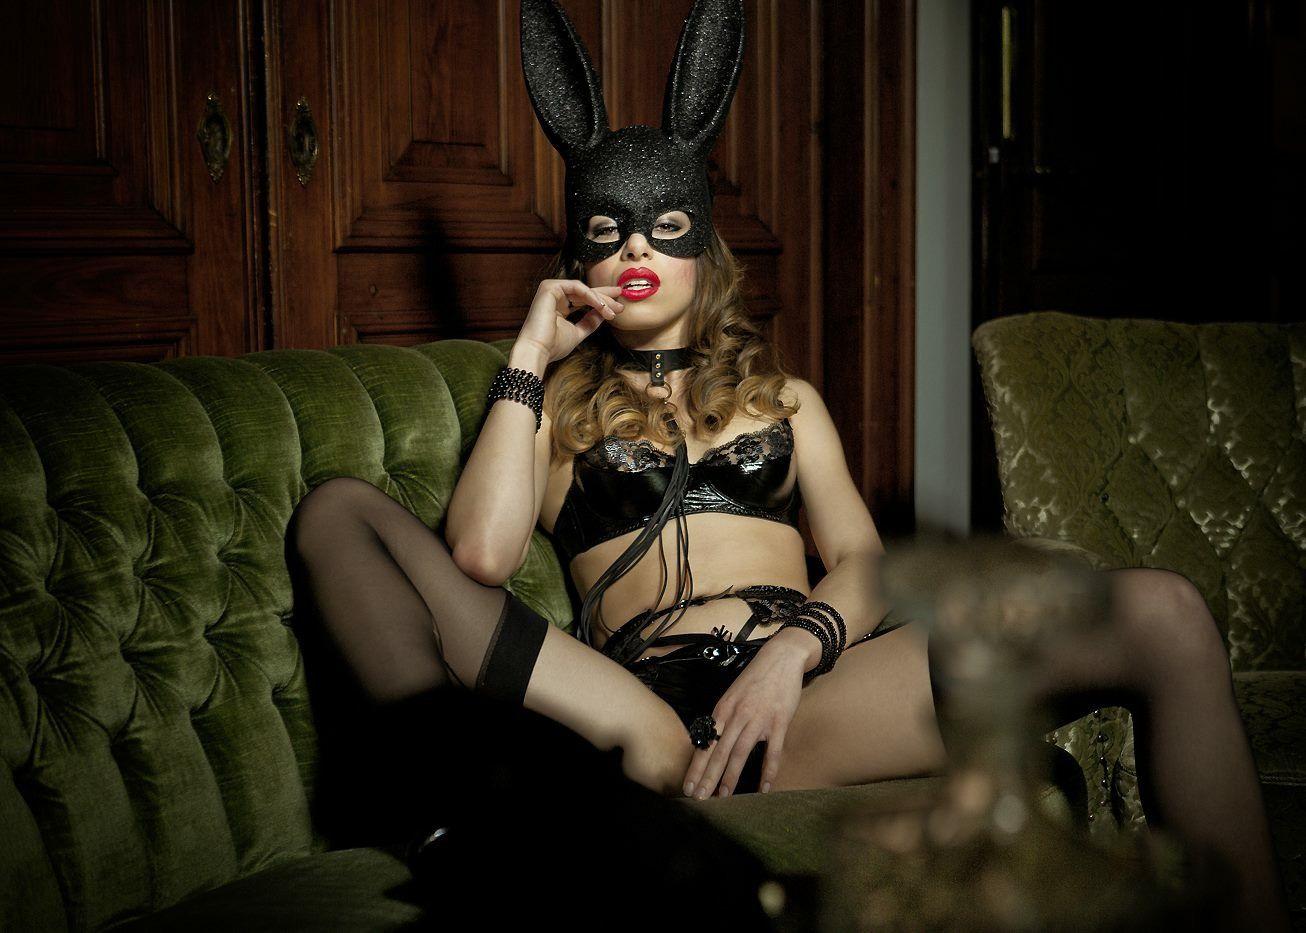 Feet Chiara Bianchino nudes (78 photos), Ass, Paparazzi, Selfie, braless 2006